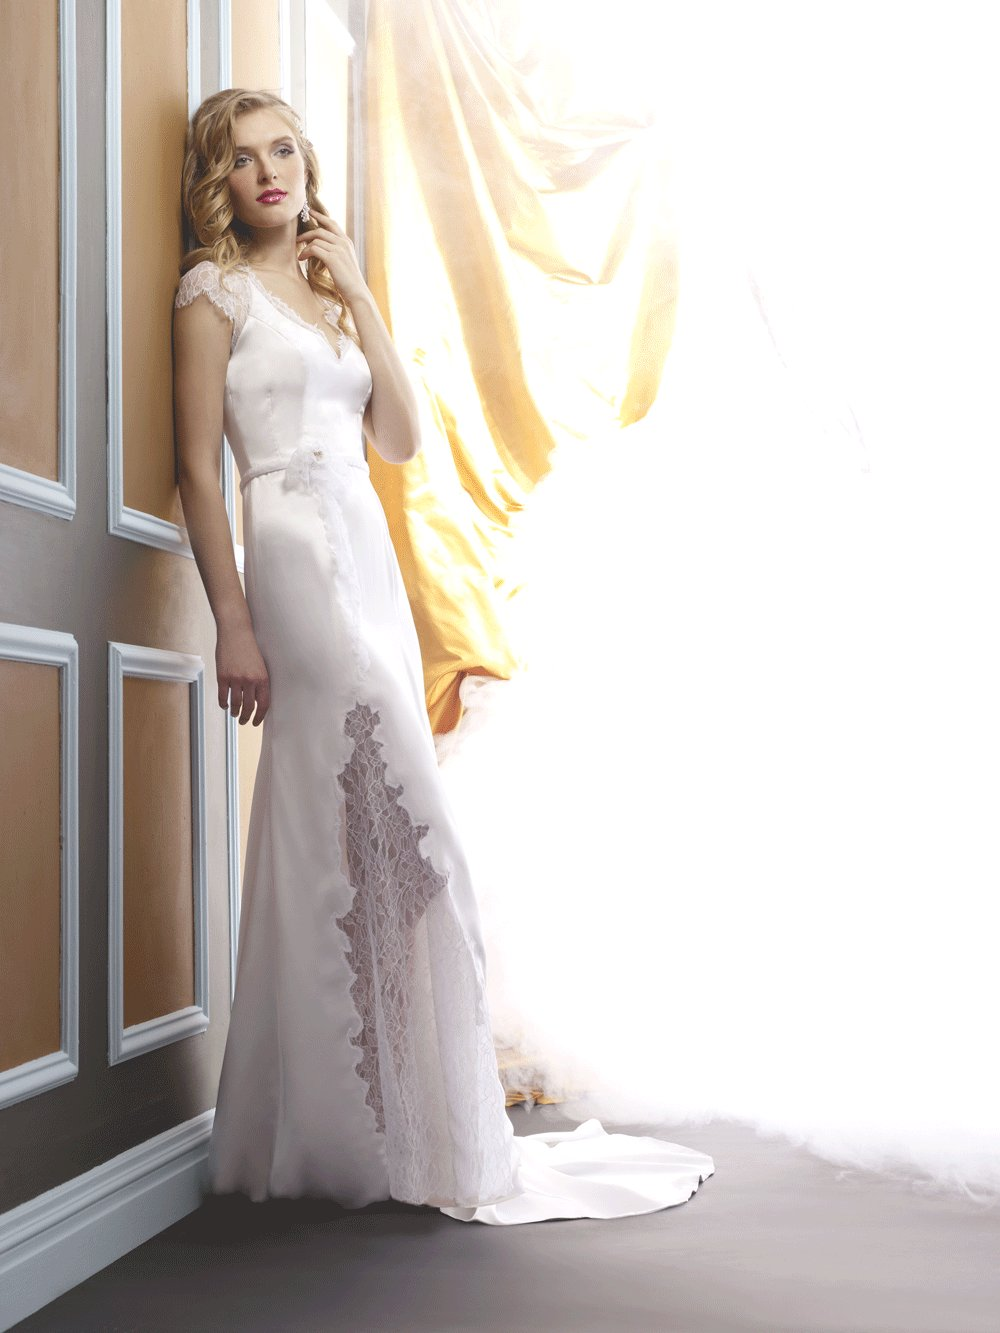 Wedding-dress-by-birnbaum-and-bullock-2013-bridal-paloma.full